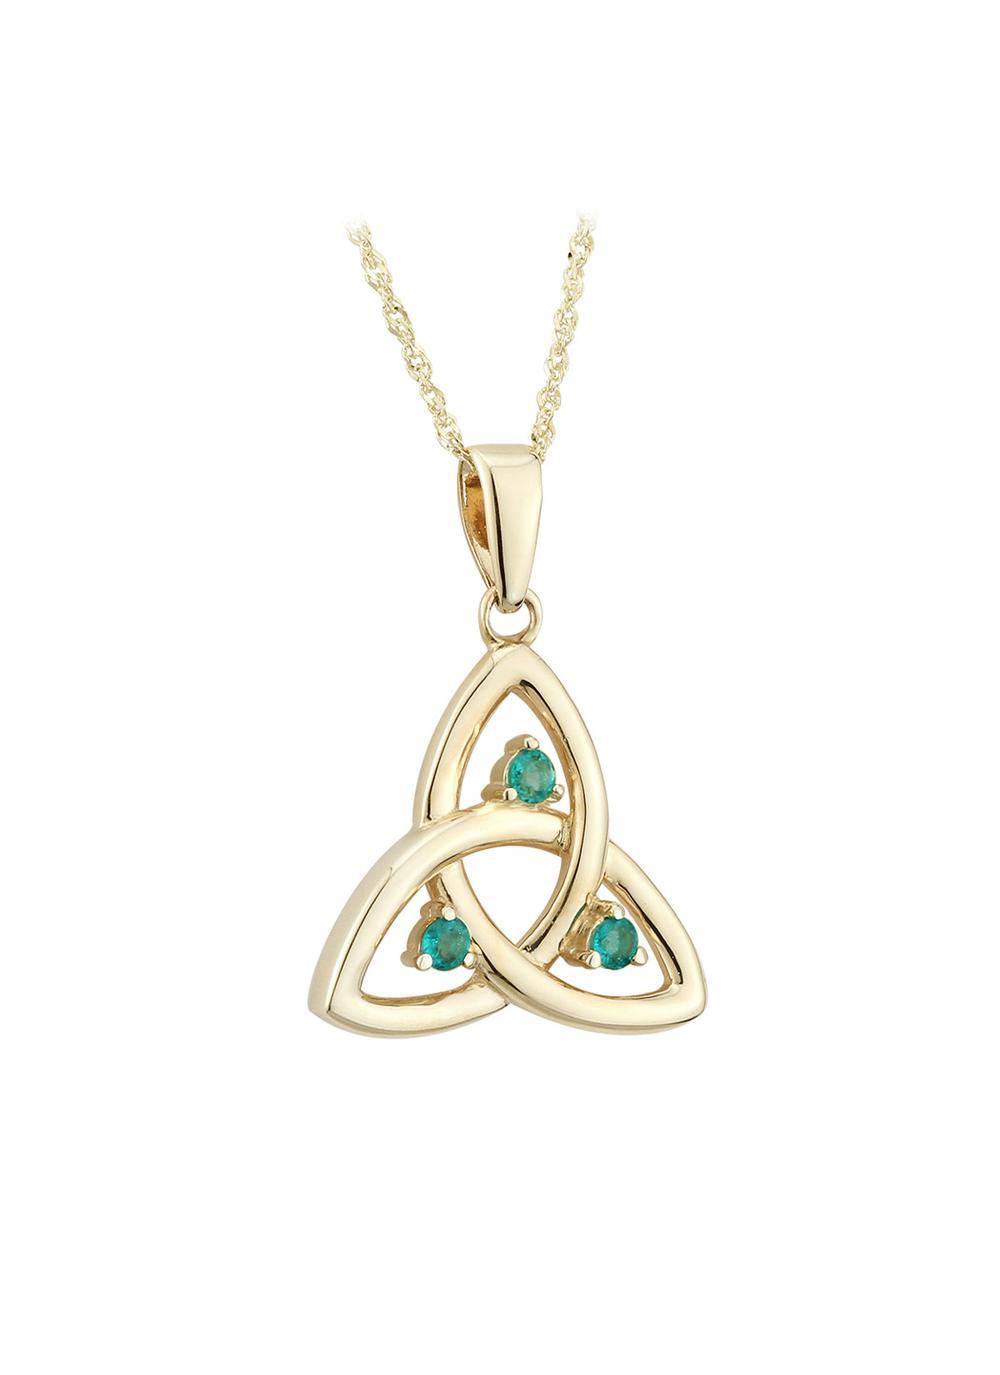 14k gold emerald trinity knot pendant blarney 14k gold emerald trinity knot pendant aloadofball Choice Image